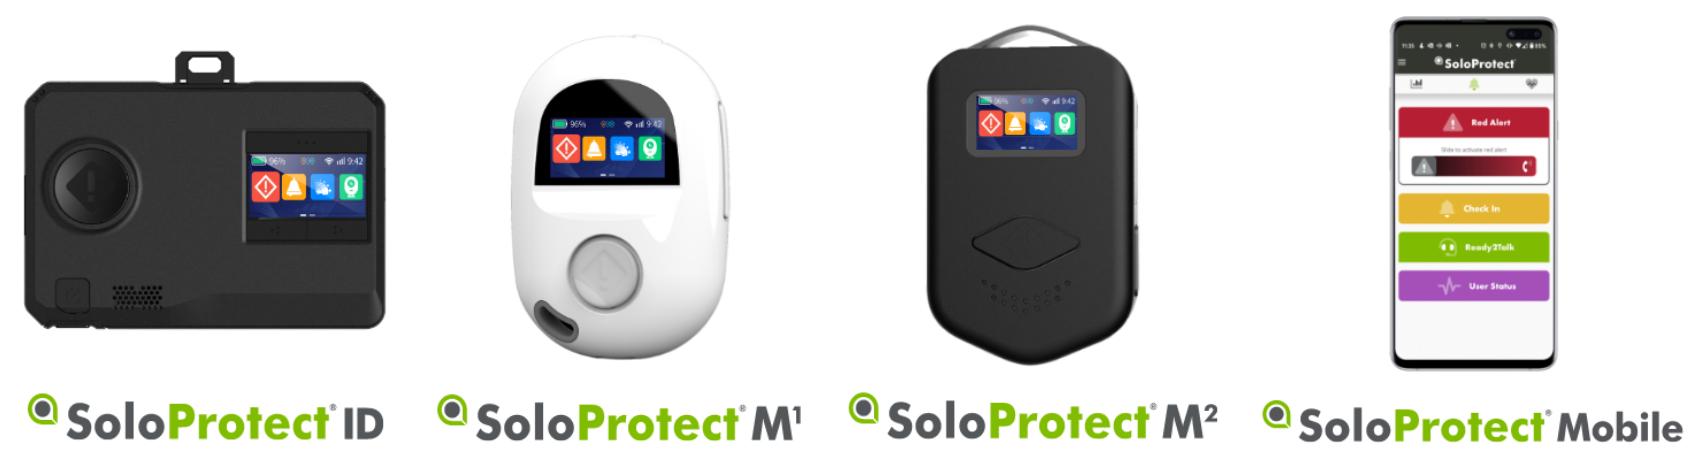 Alarmsystemen van SoloProtect (ID, M1, M2 en App)